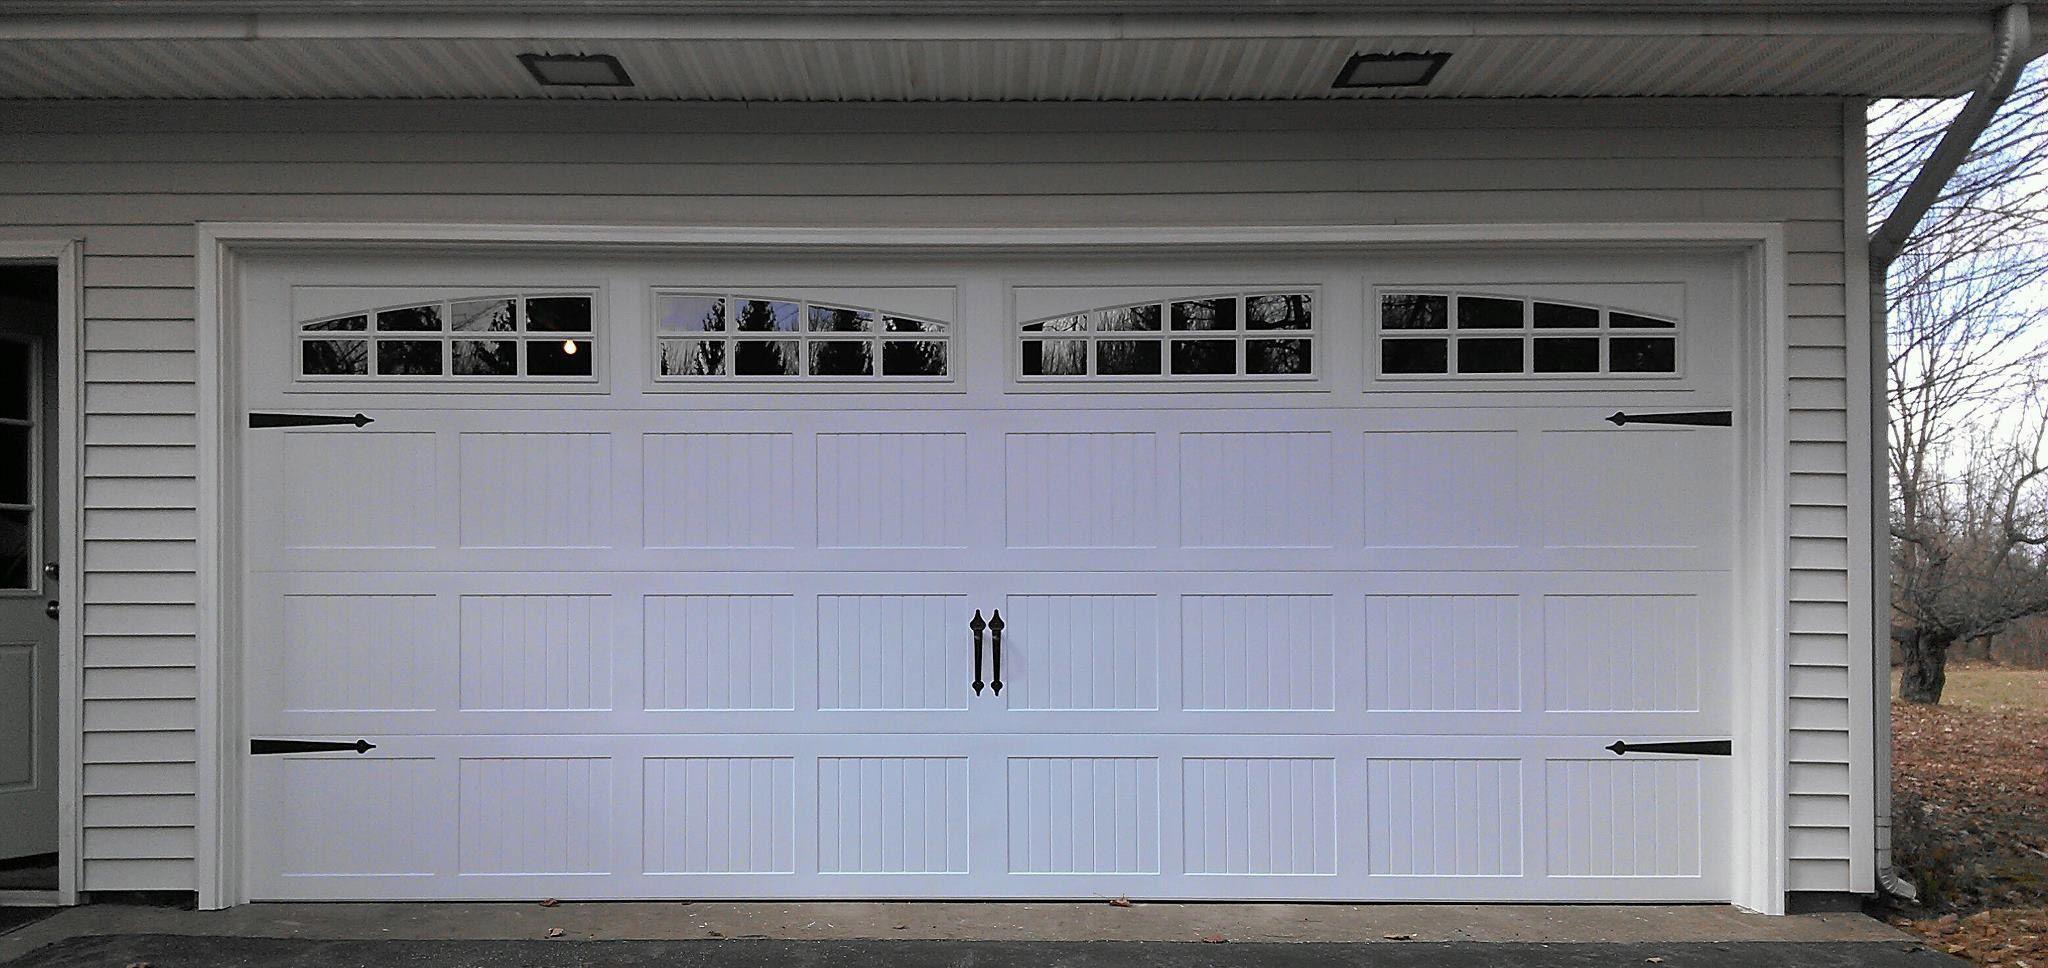 Clopay Window Inserts For Your Clopay Garage Door Windows Replace Your Old Decorative Window Inserts W Garage Doors Garage Door Decor Home Depot Garage Doors